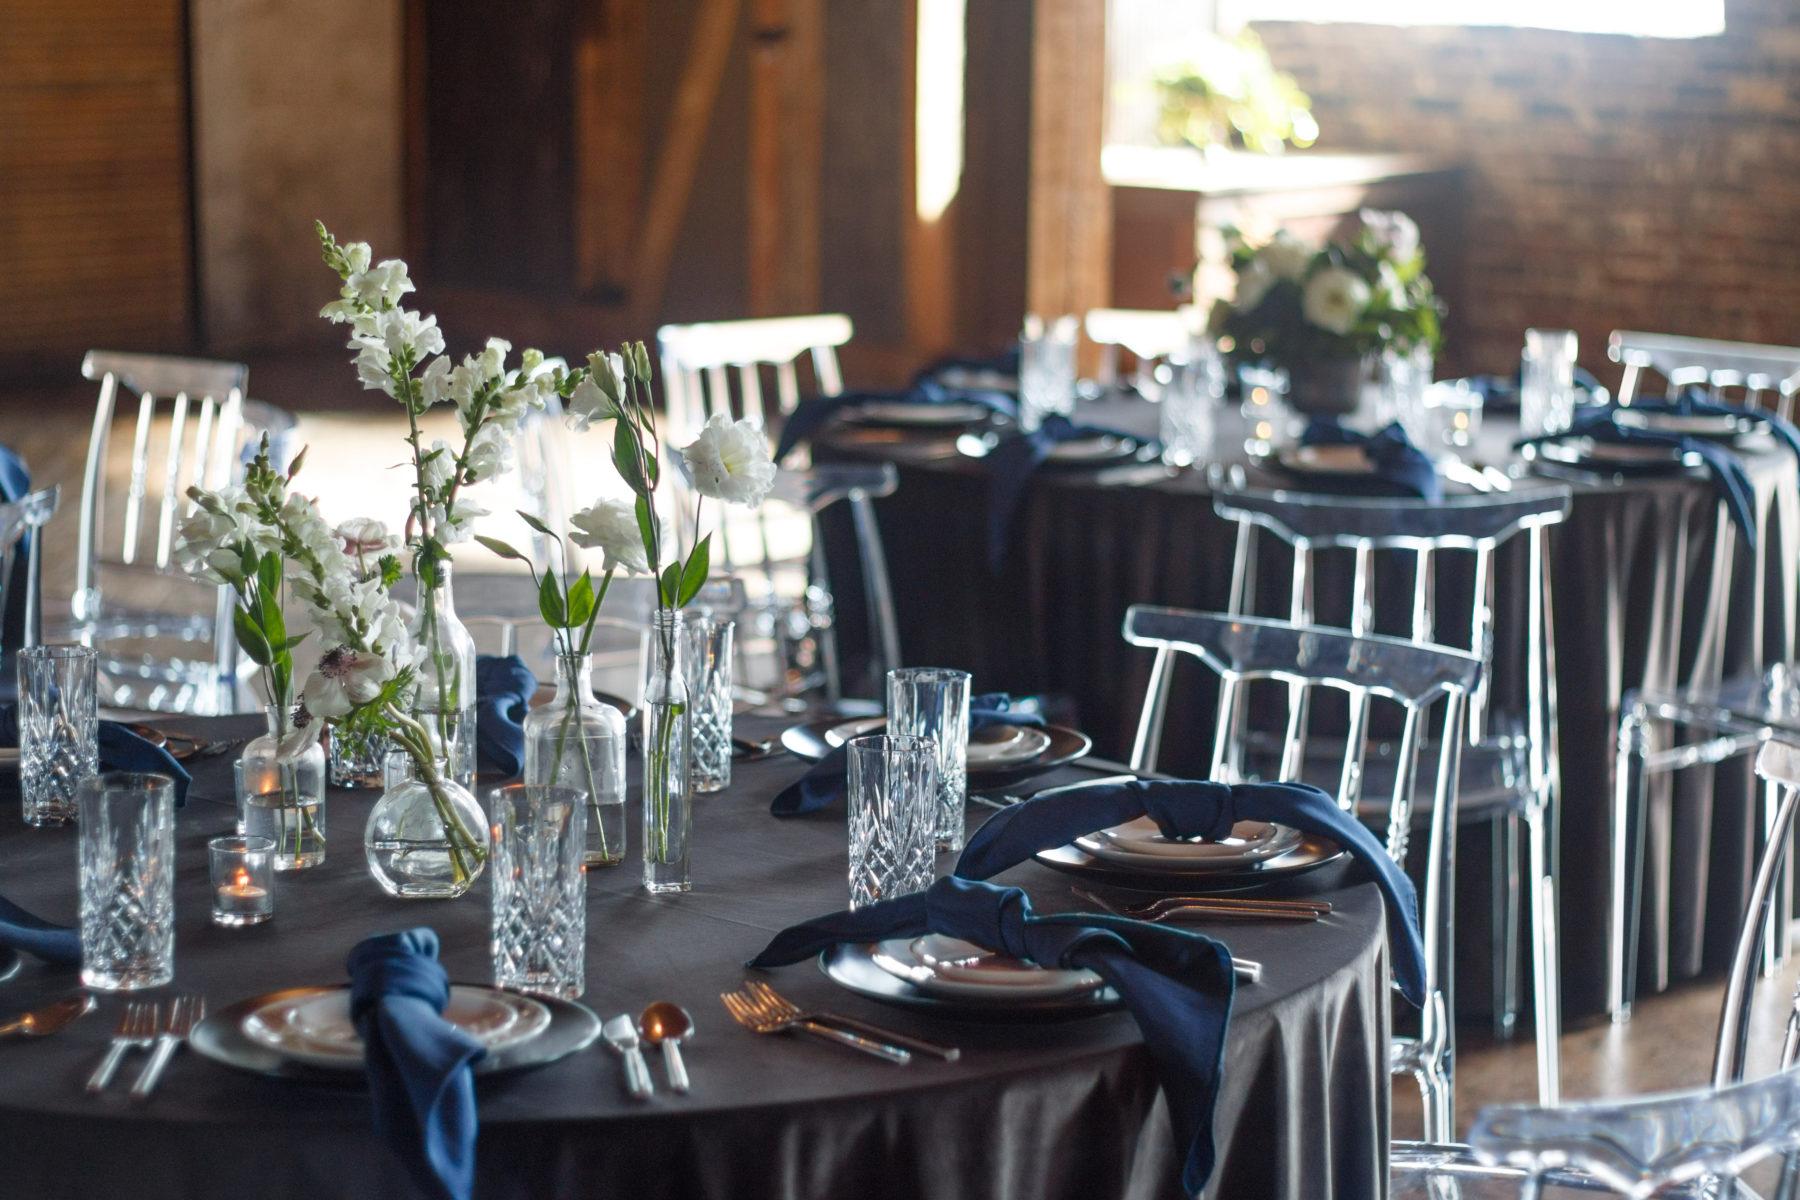 Meet Nashville wedding venue Guitar & Cadillac featured on Nashville Bride Guide